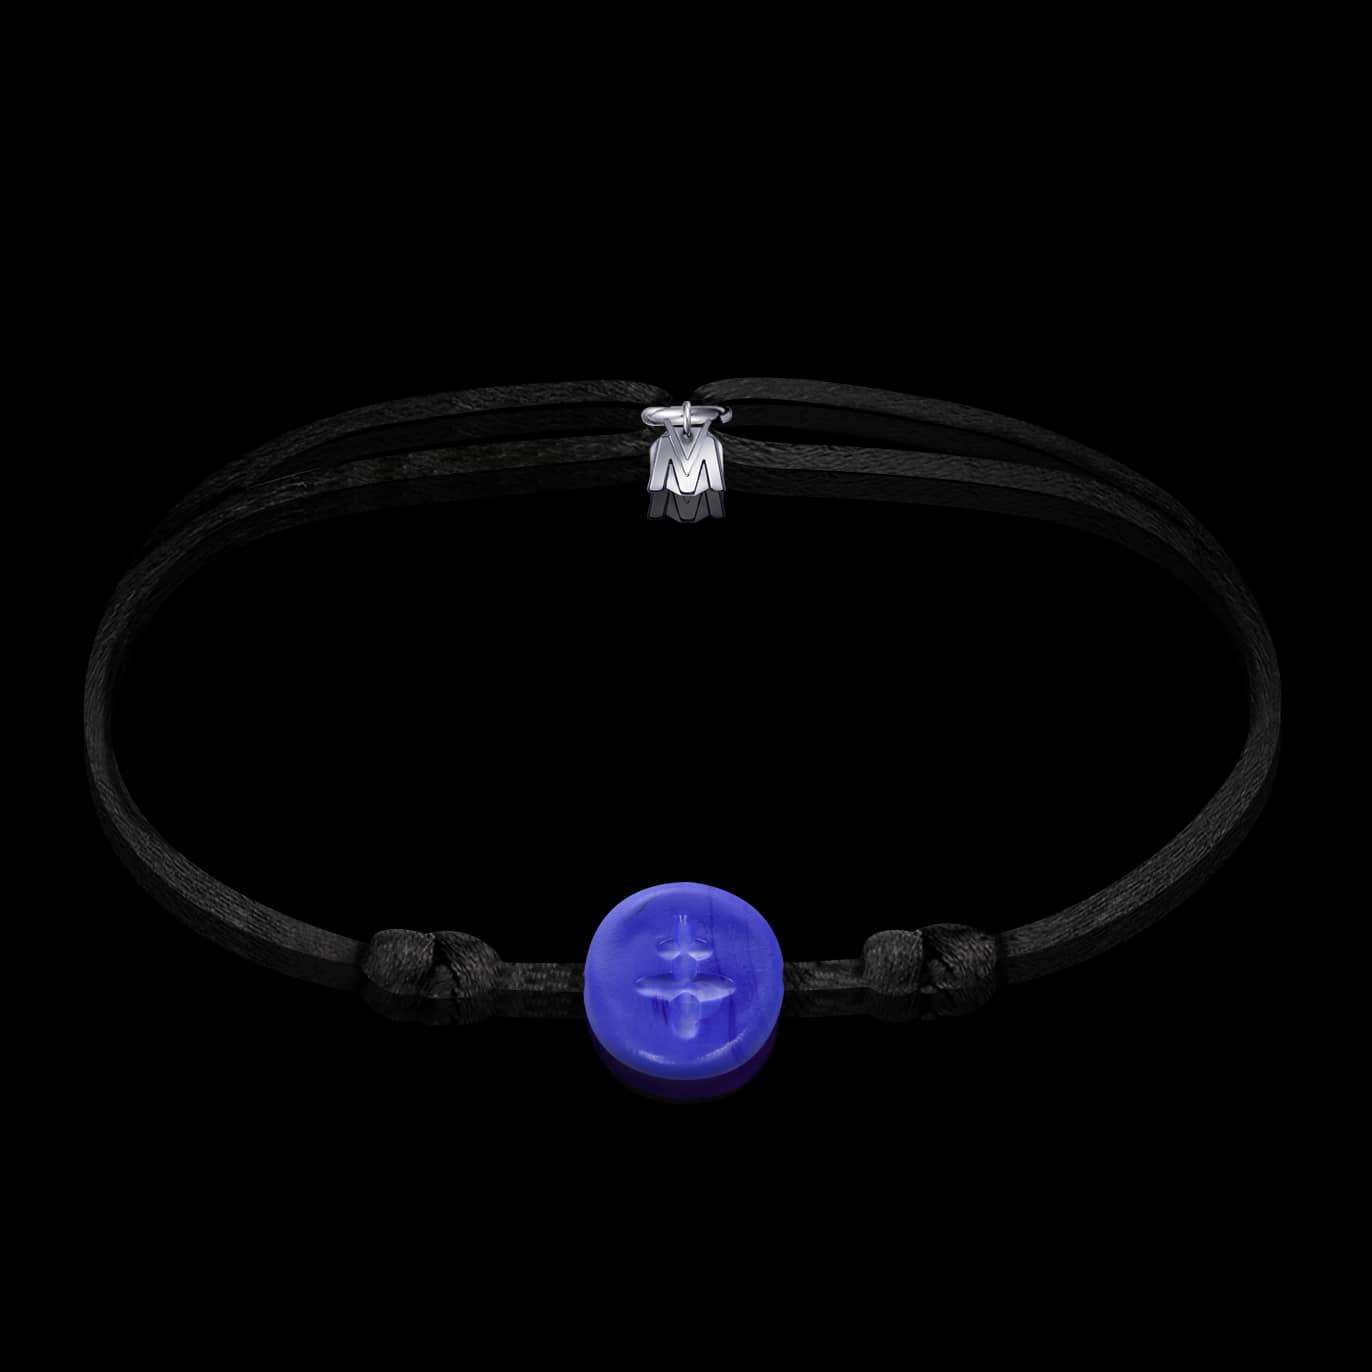 bracelet-croix-de-lorraine-taille